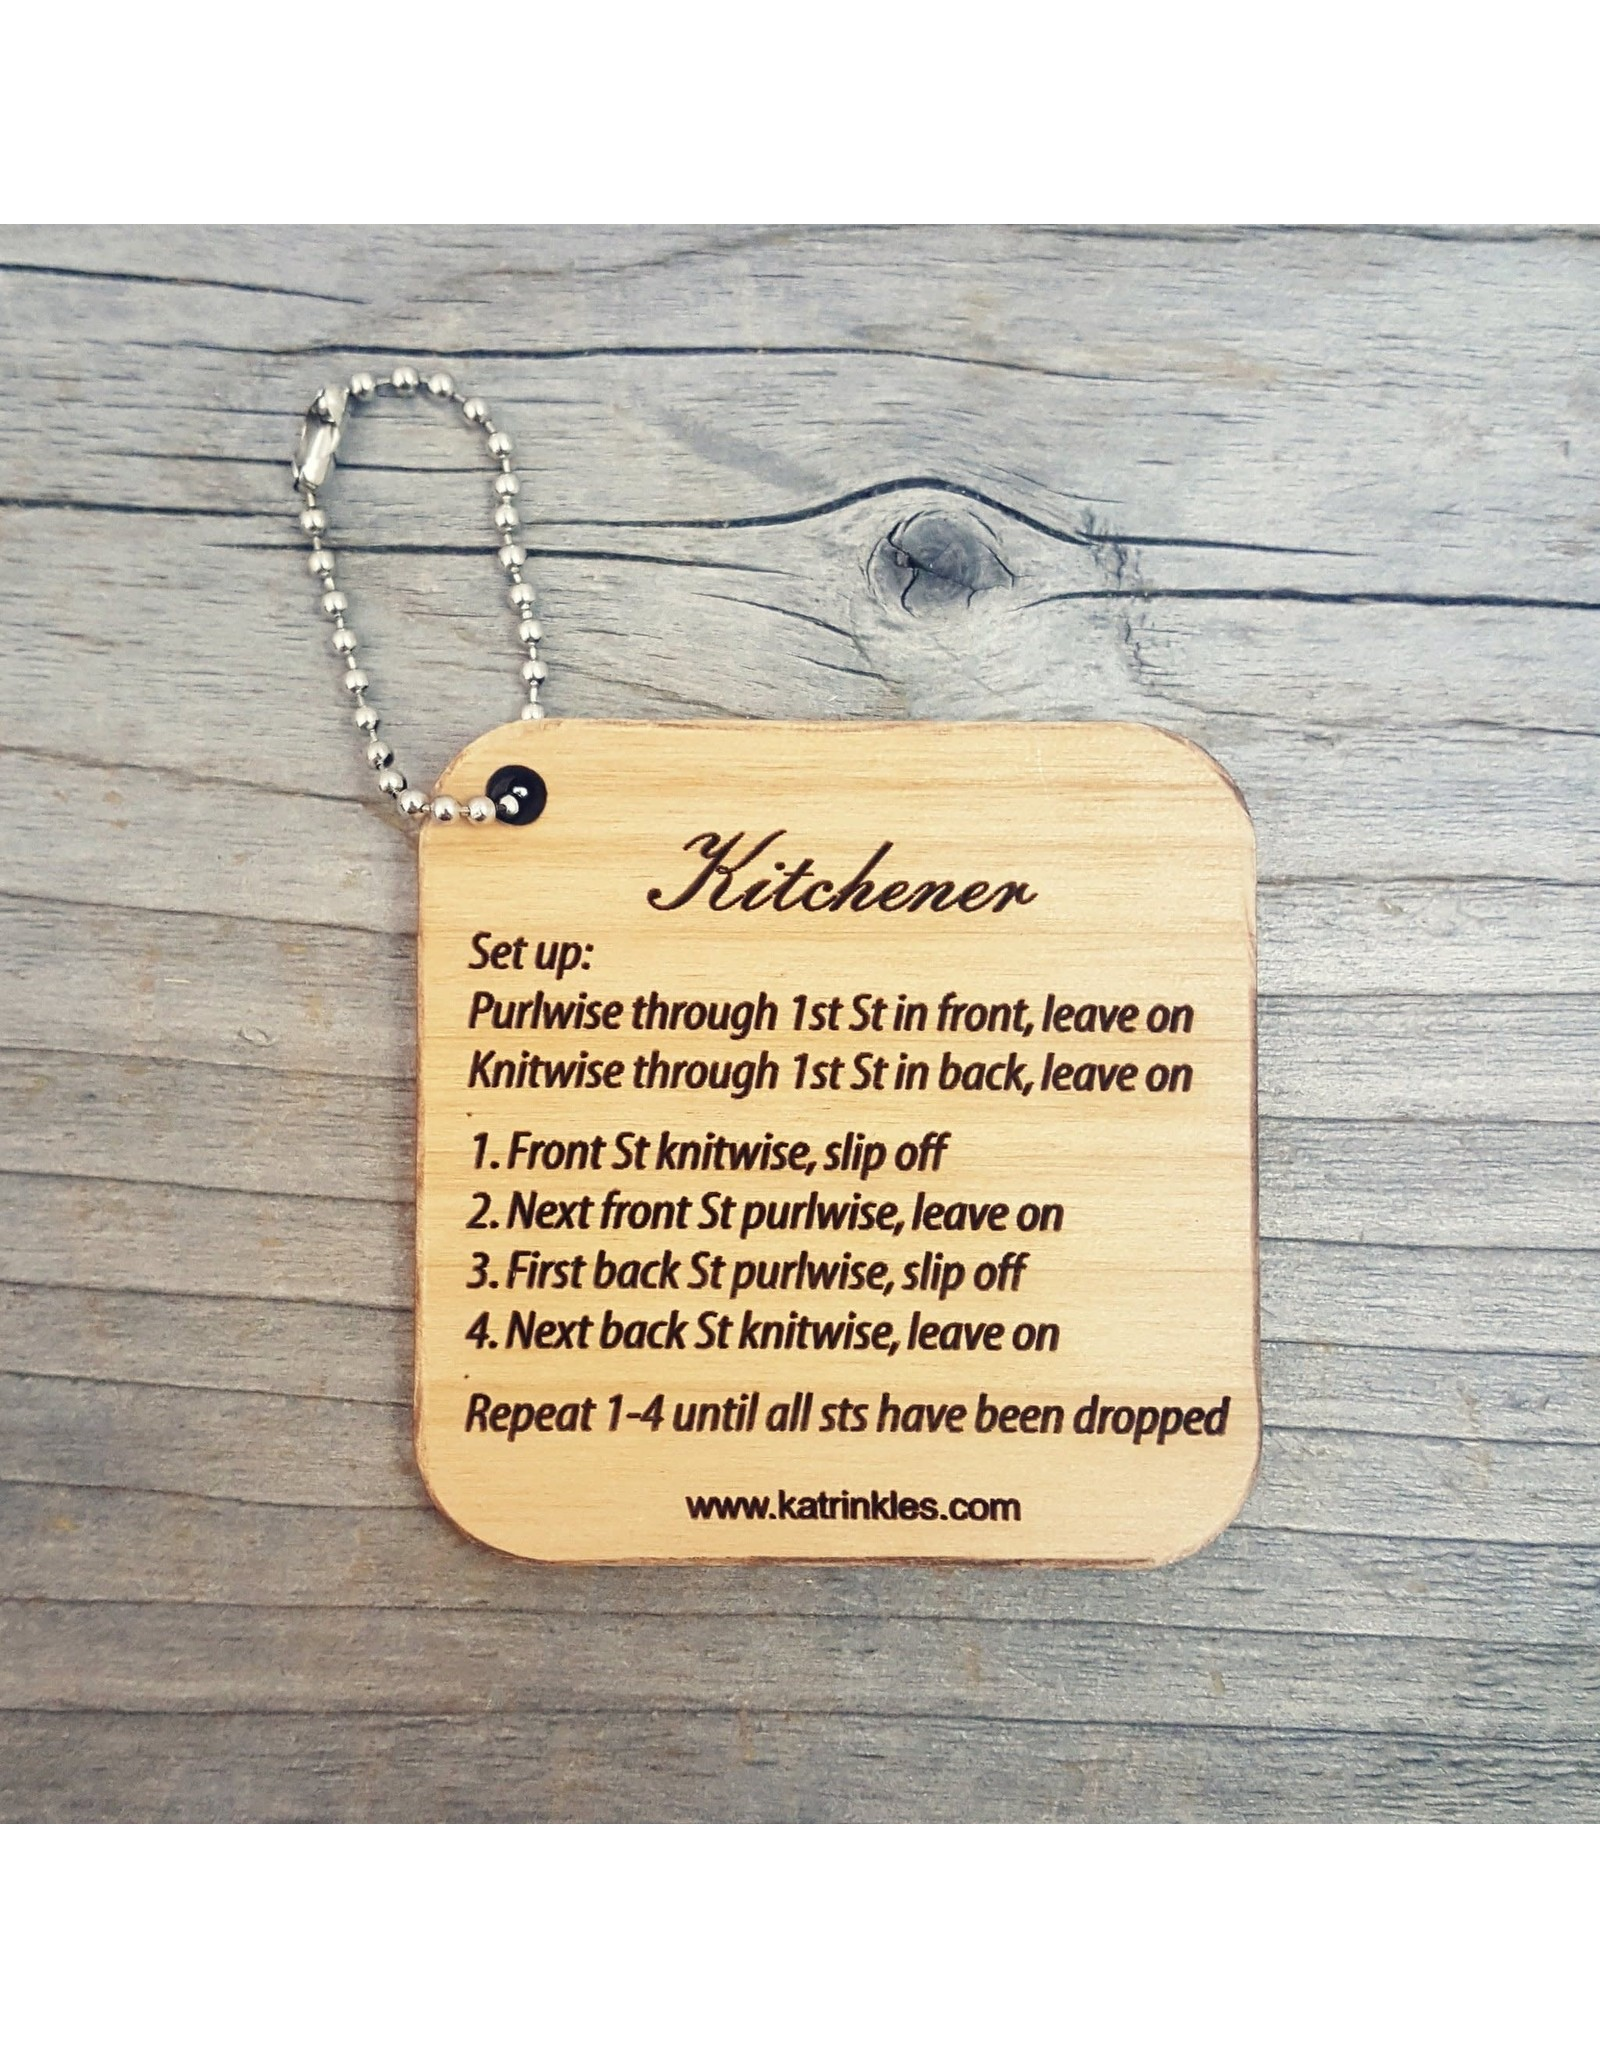 Mix 'n' Match Mini Tool - Kitchener by Katrinkles